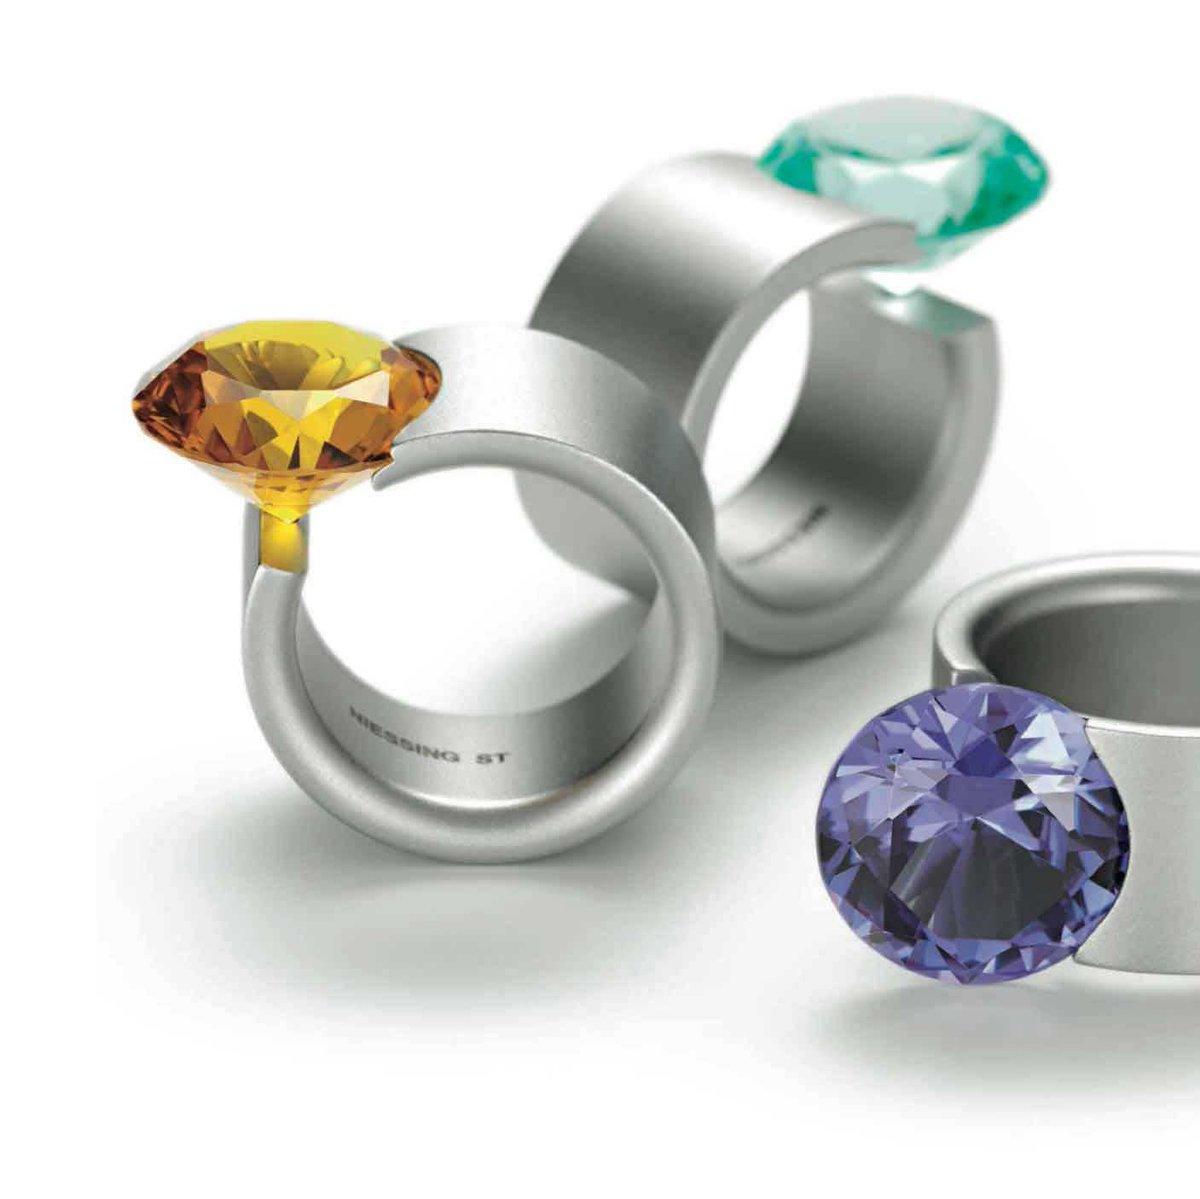 8e4680c23 ORRO Jewellery on Twitter: